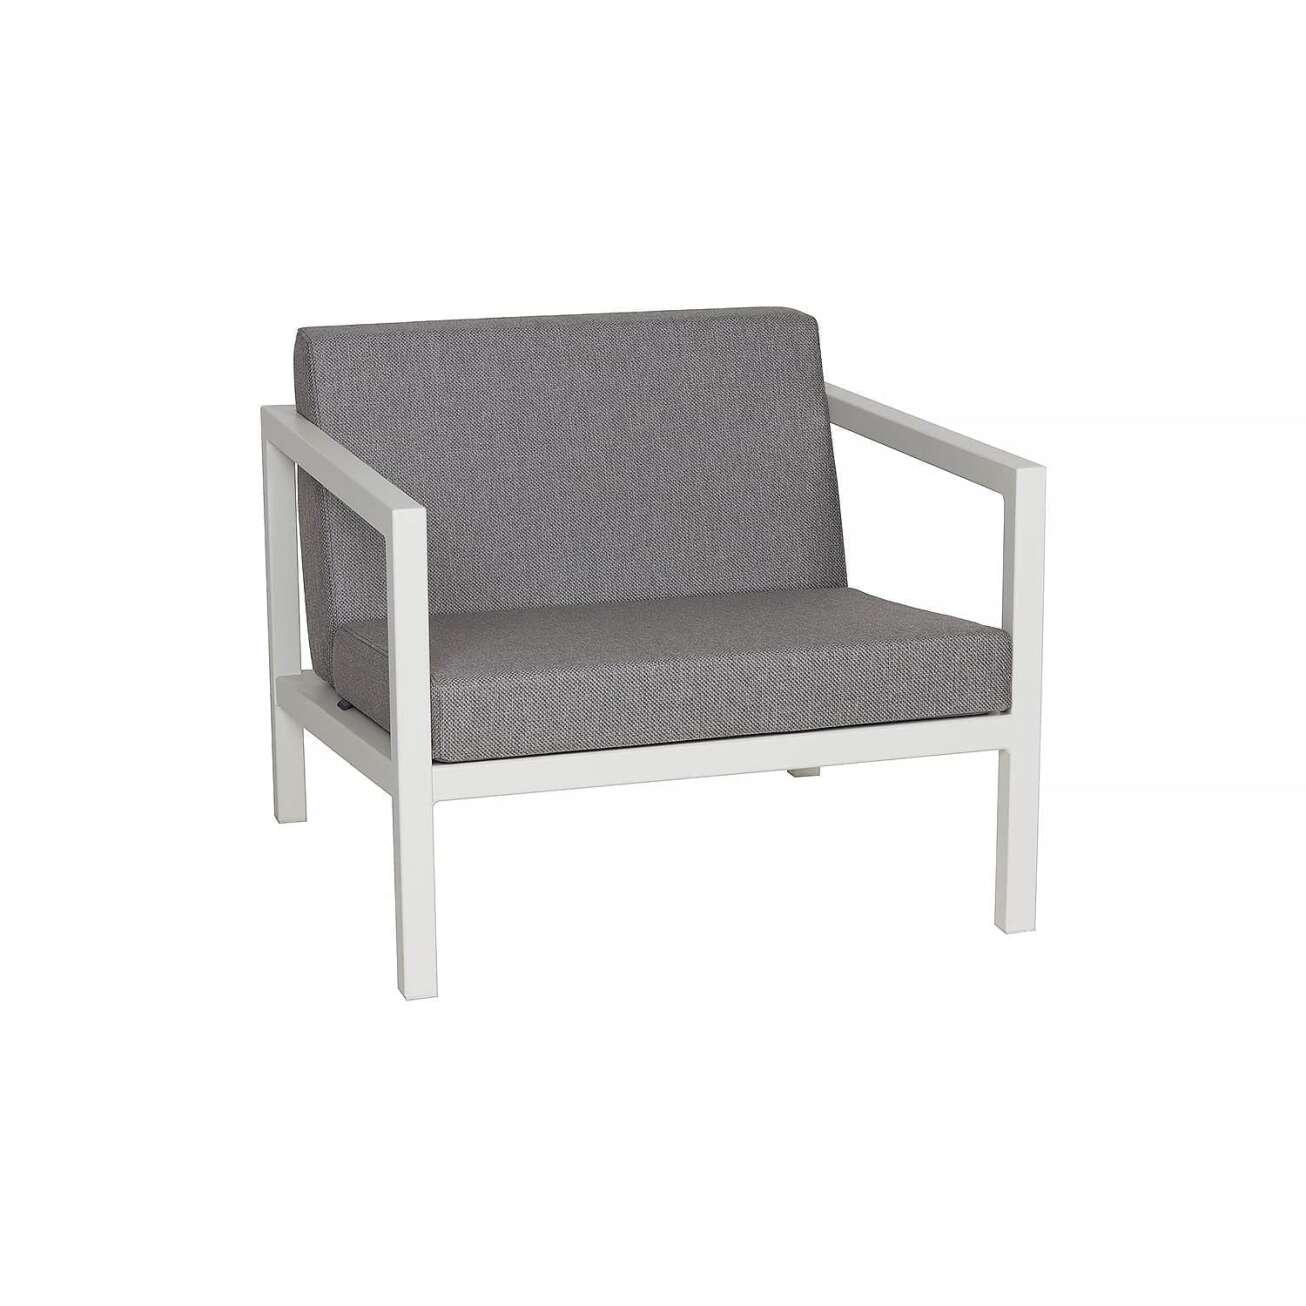 Sundays Frame sofastol i hvit aluminium med grå puter